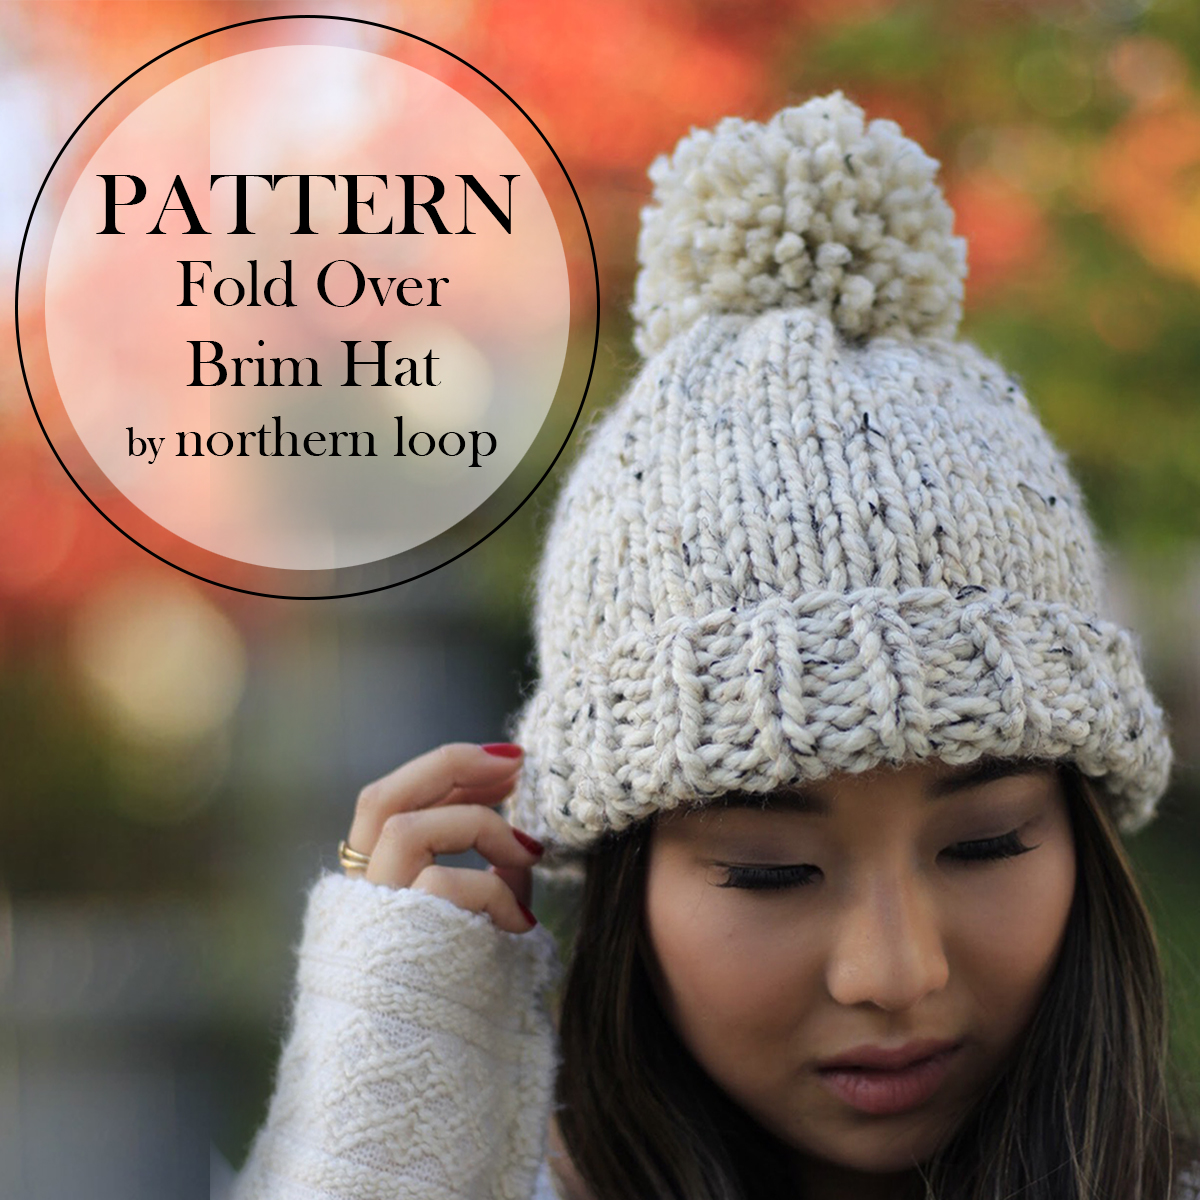 Fold Over Brim Hat.jpg